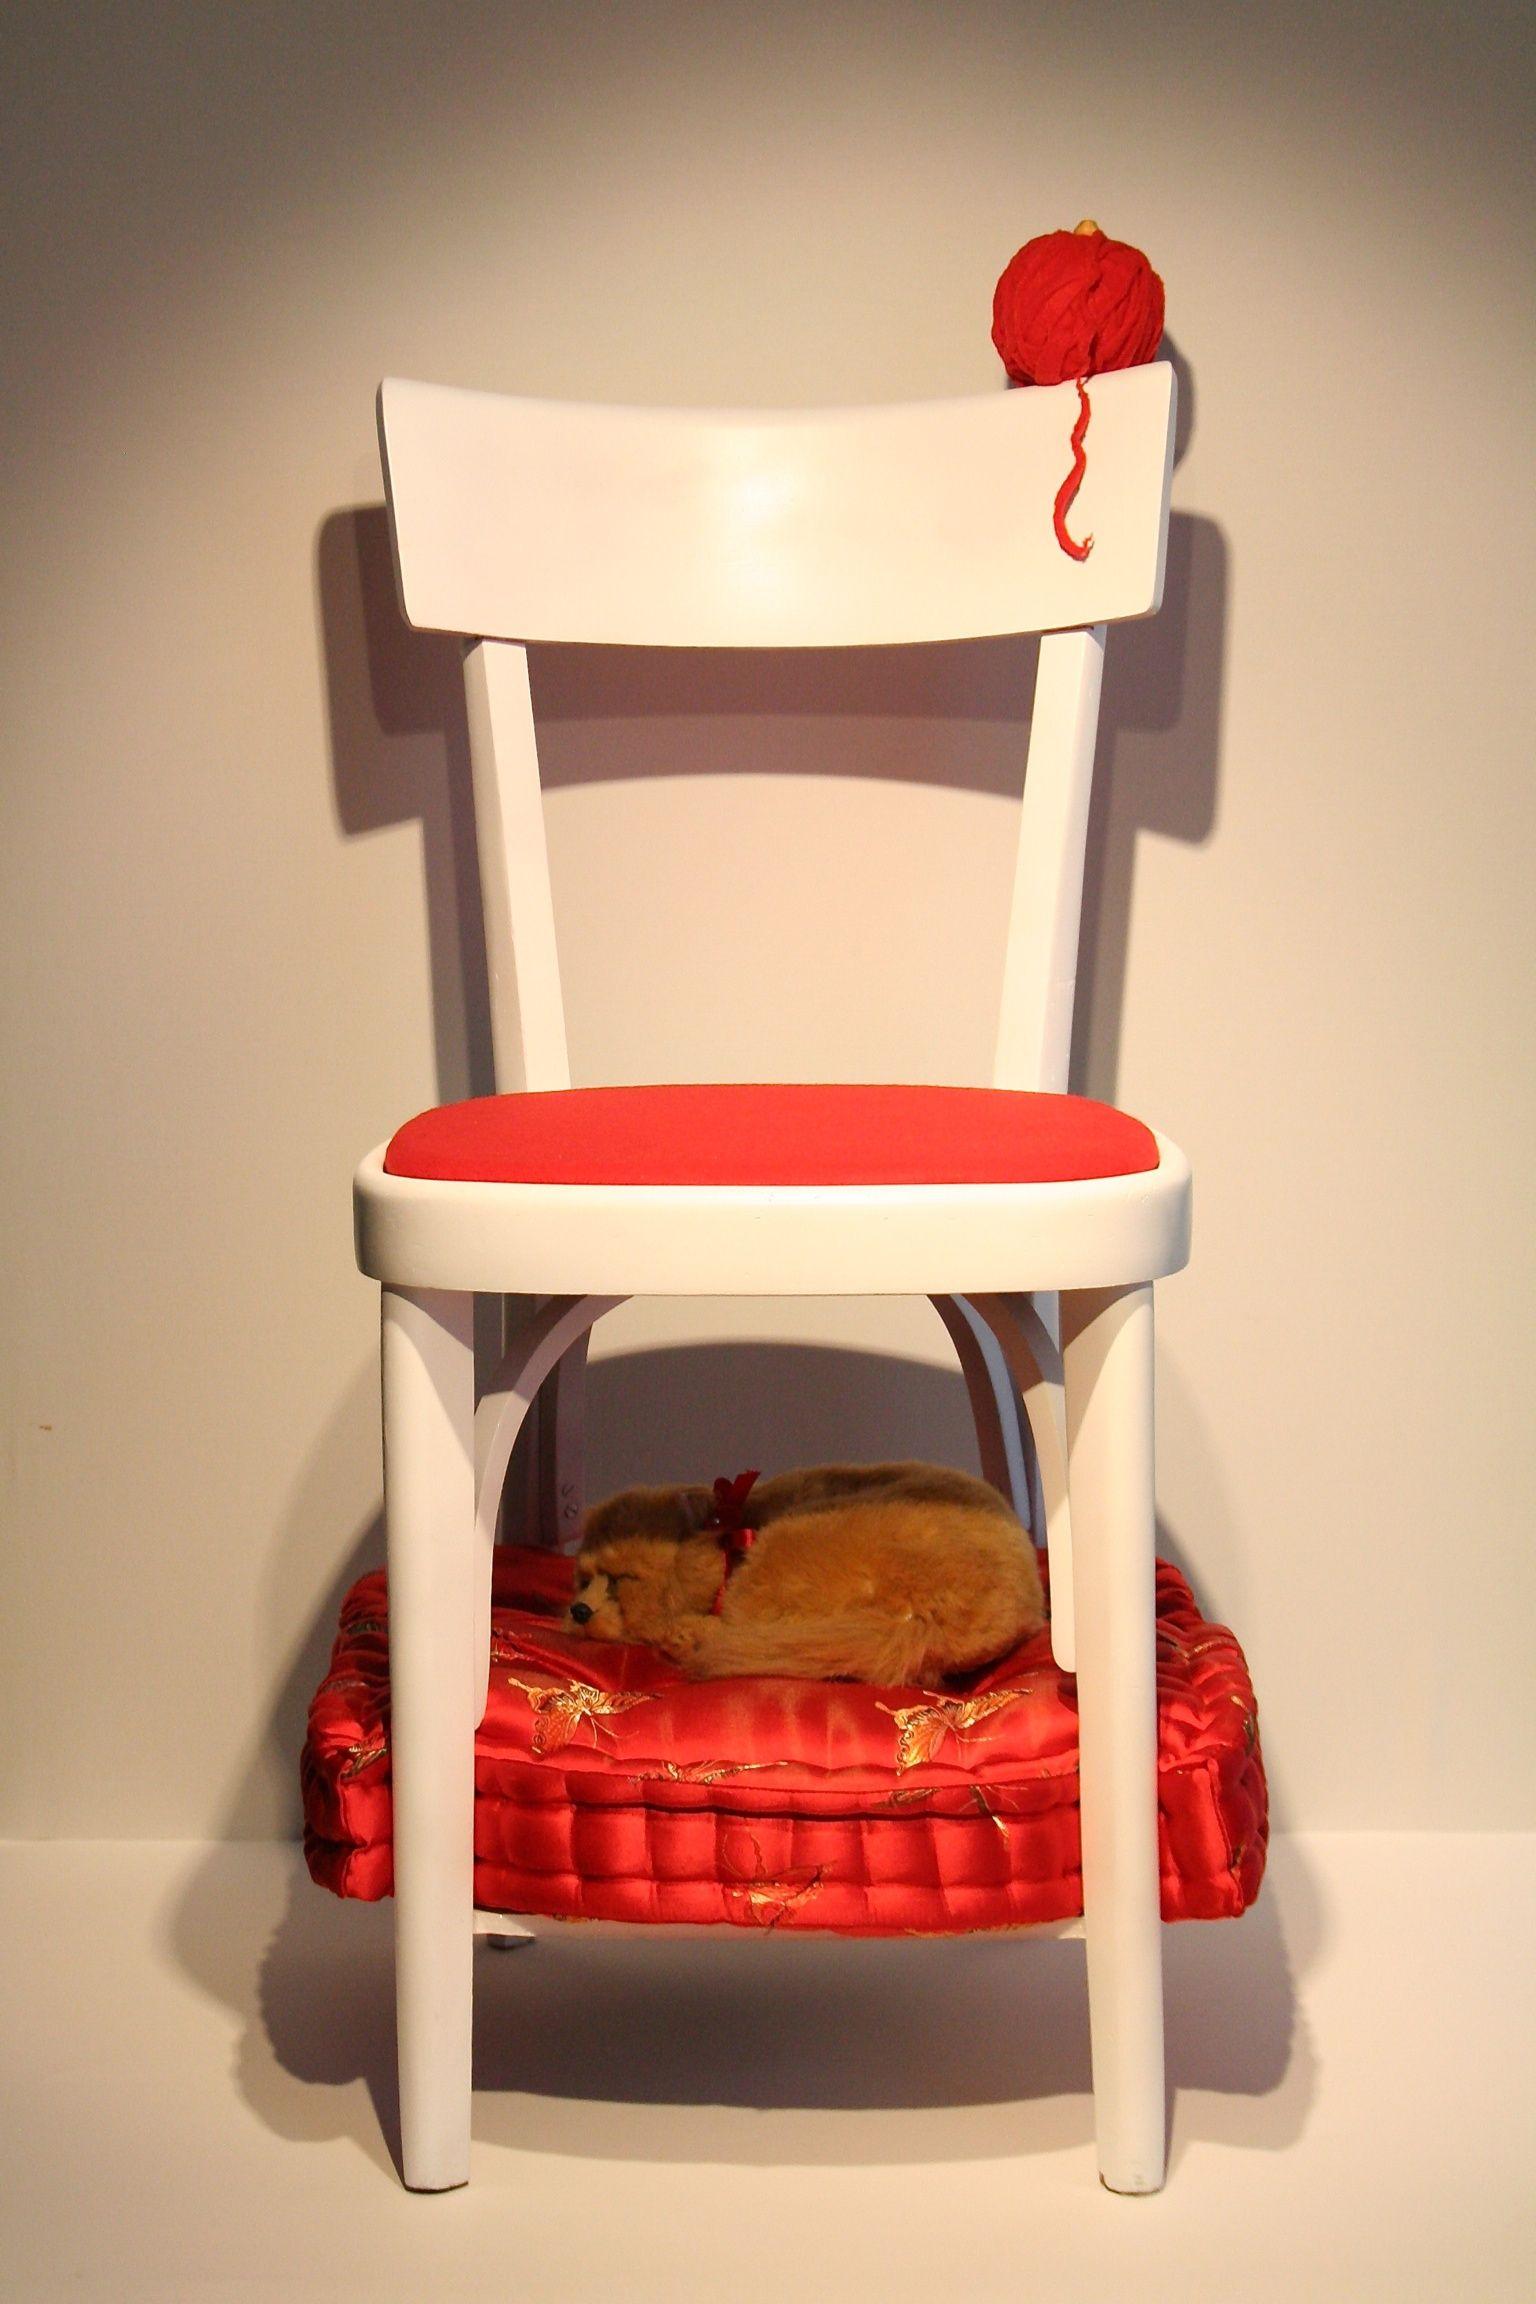 """Together chair""...see you in Venice -Magazzini Ligabue  23-25 November at Opendesignitalia 2012"